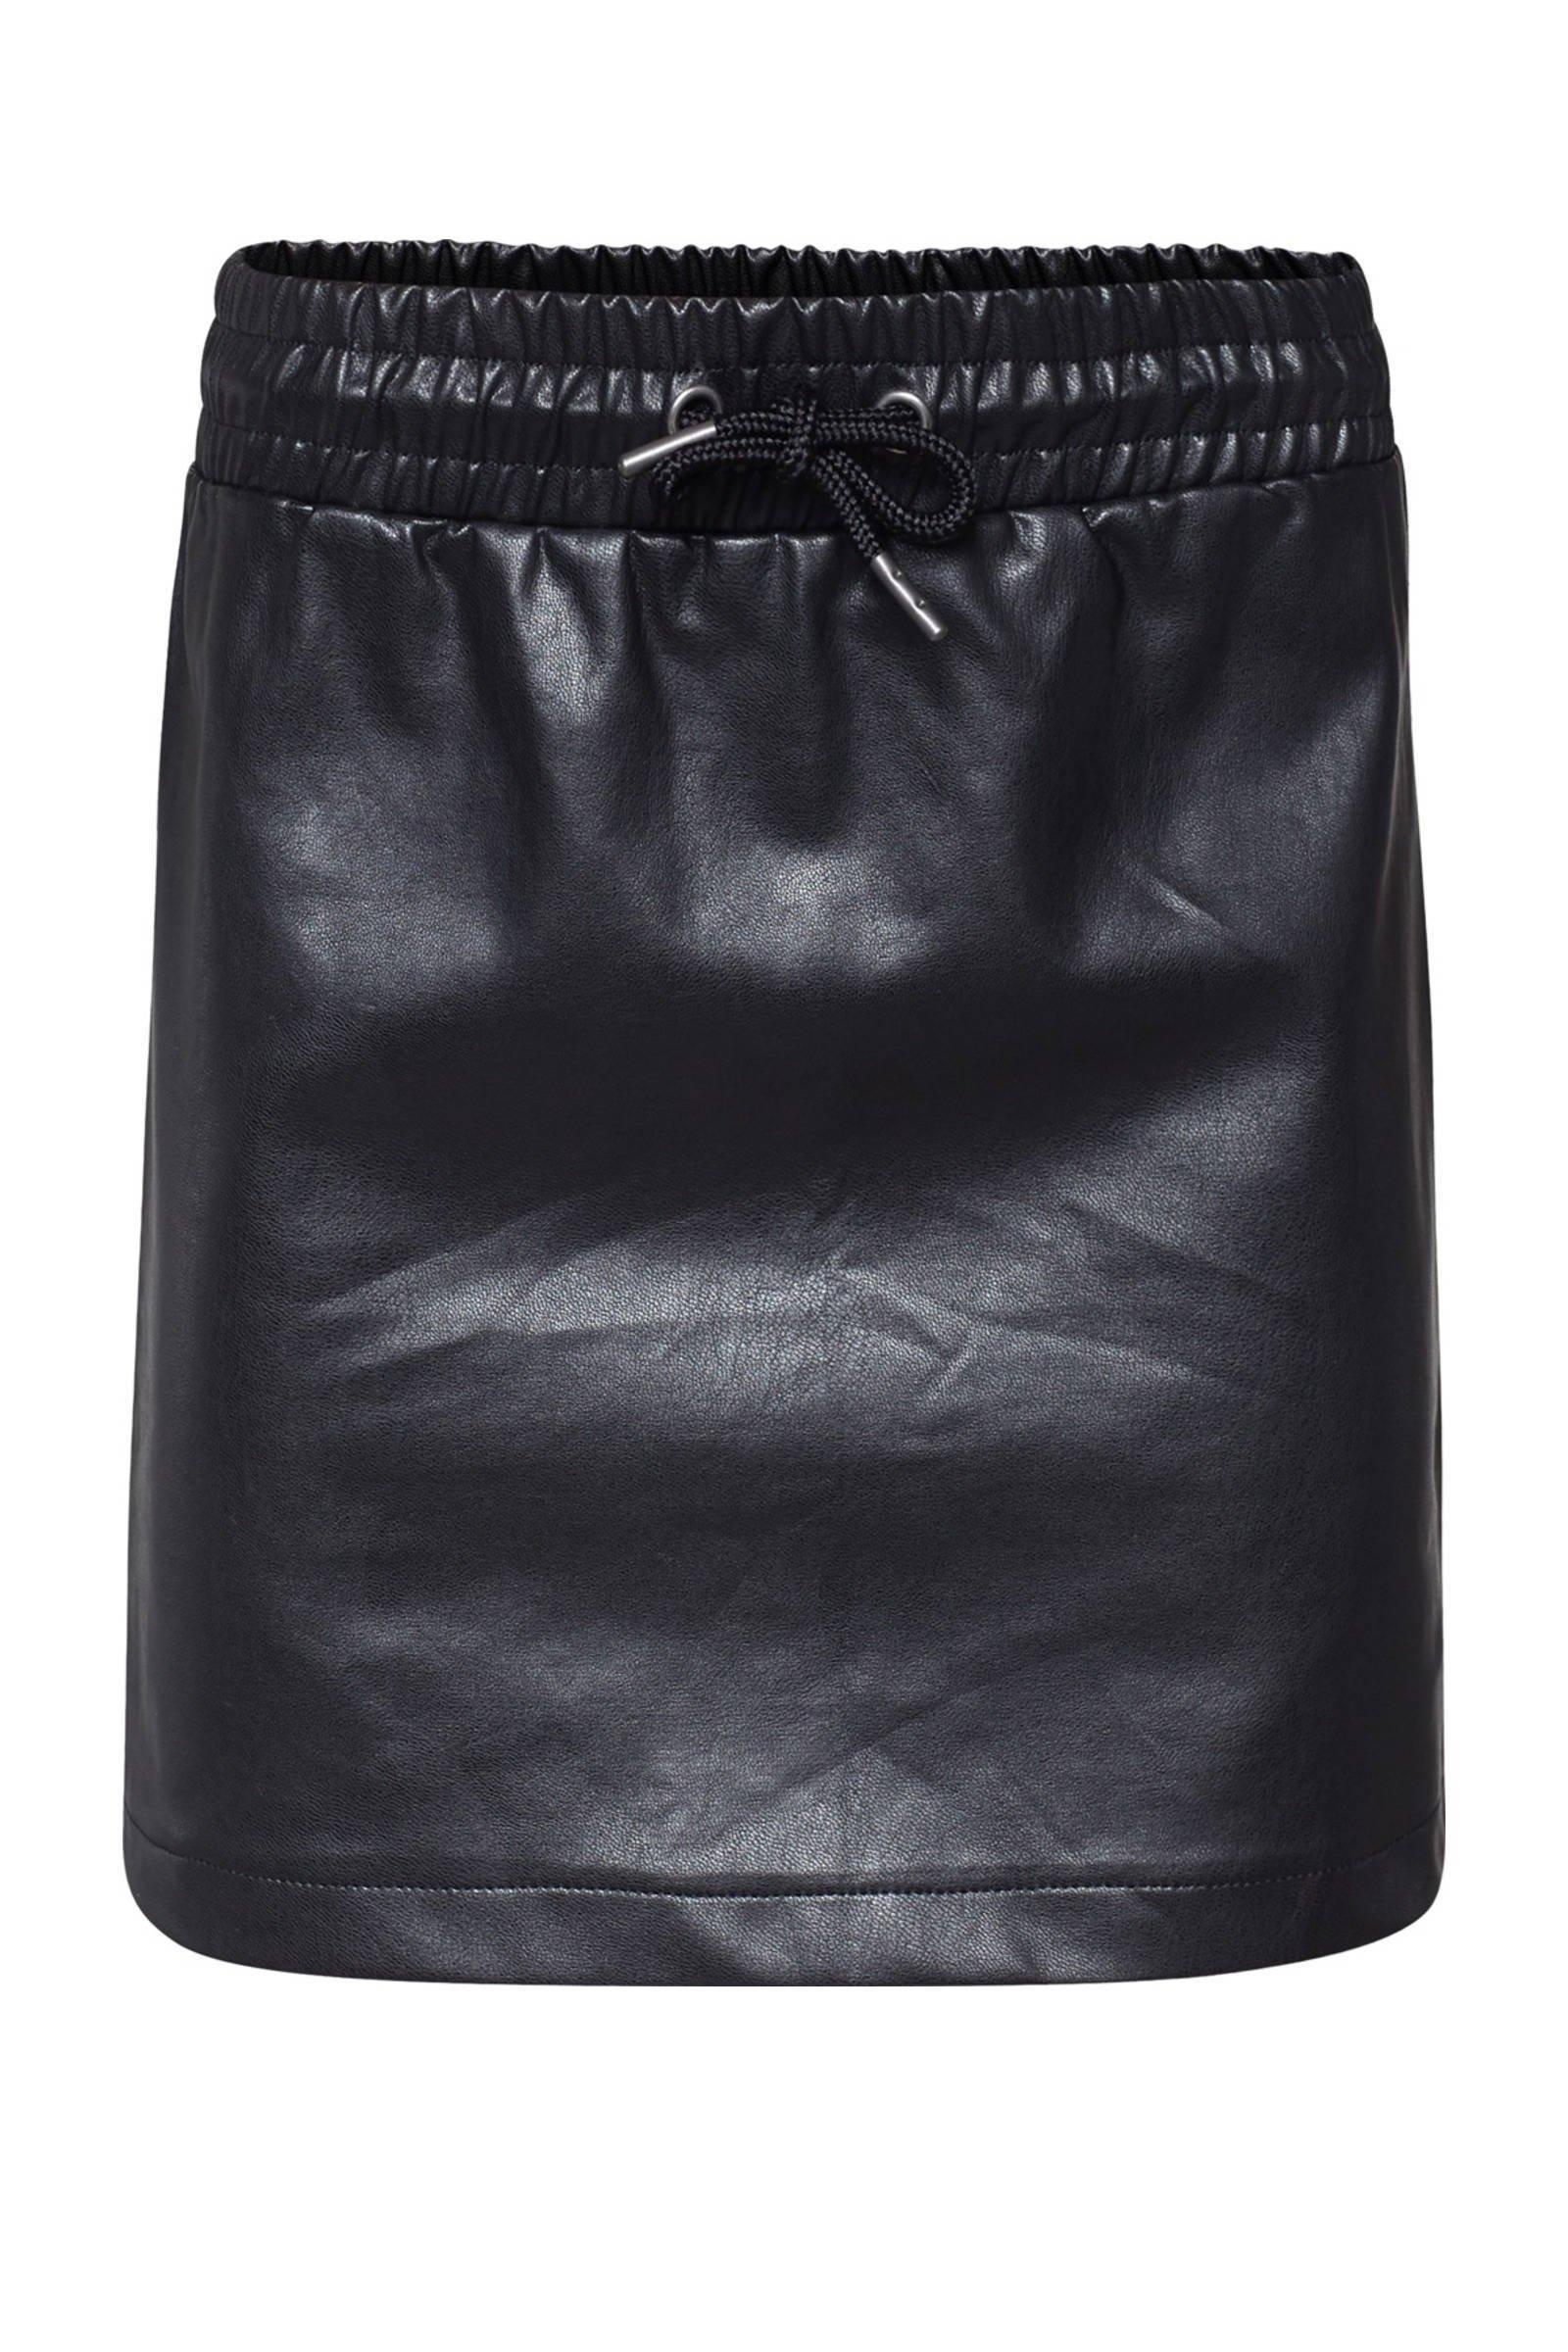 WE Fashion imitatieleren rok zwart - maat 134/140